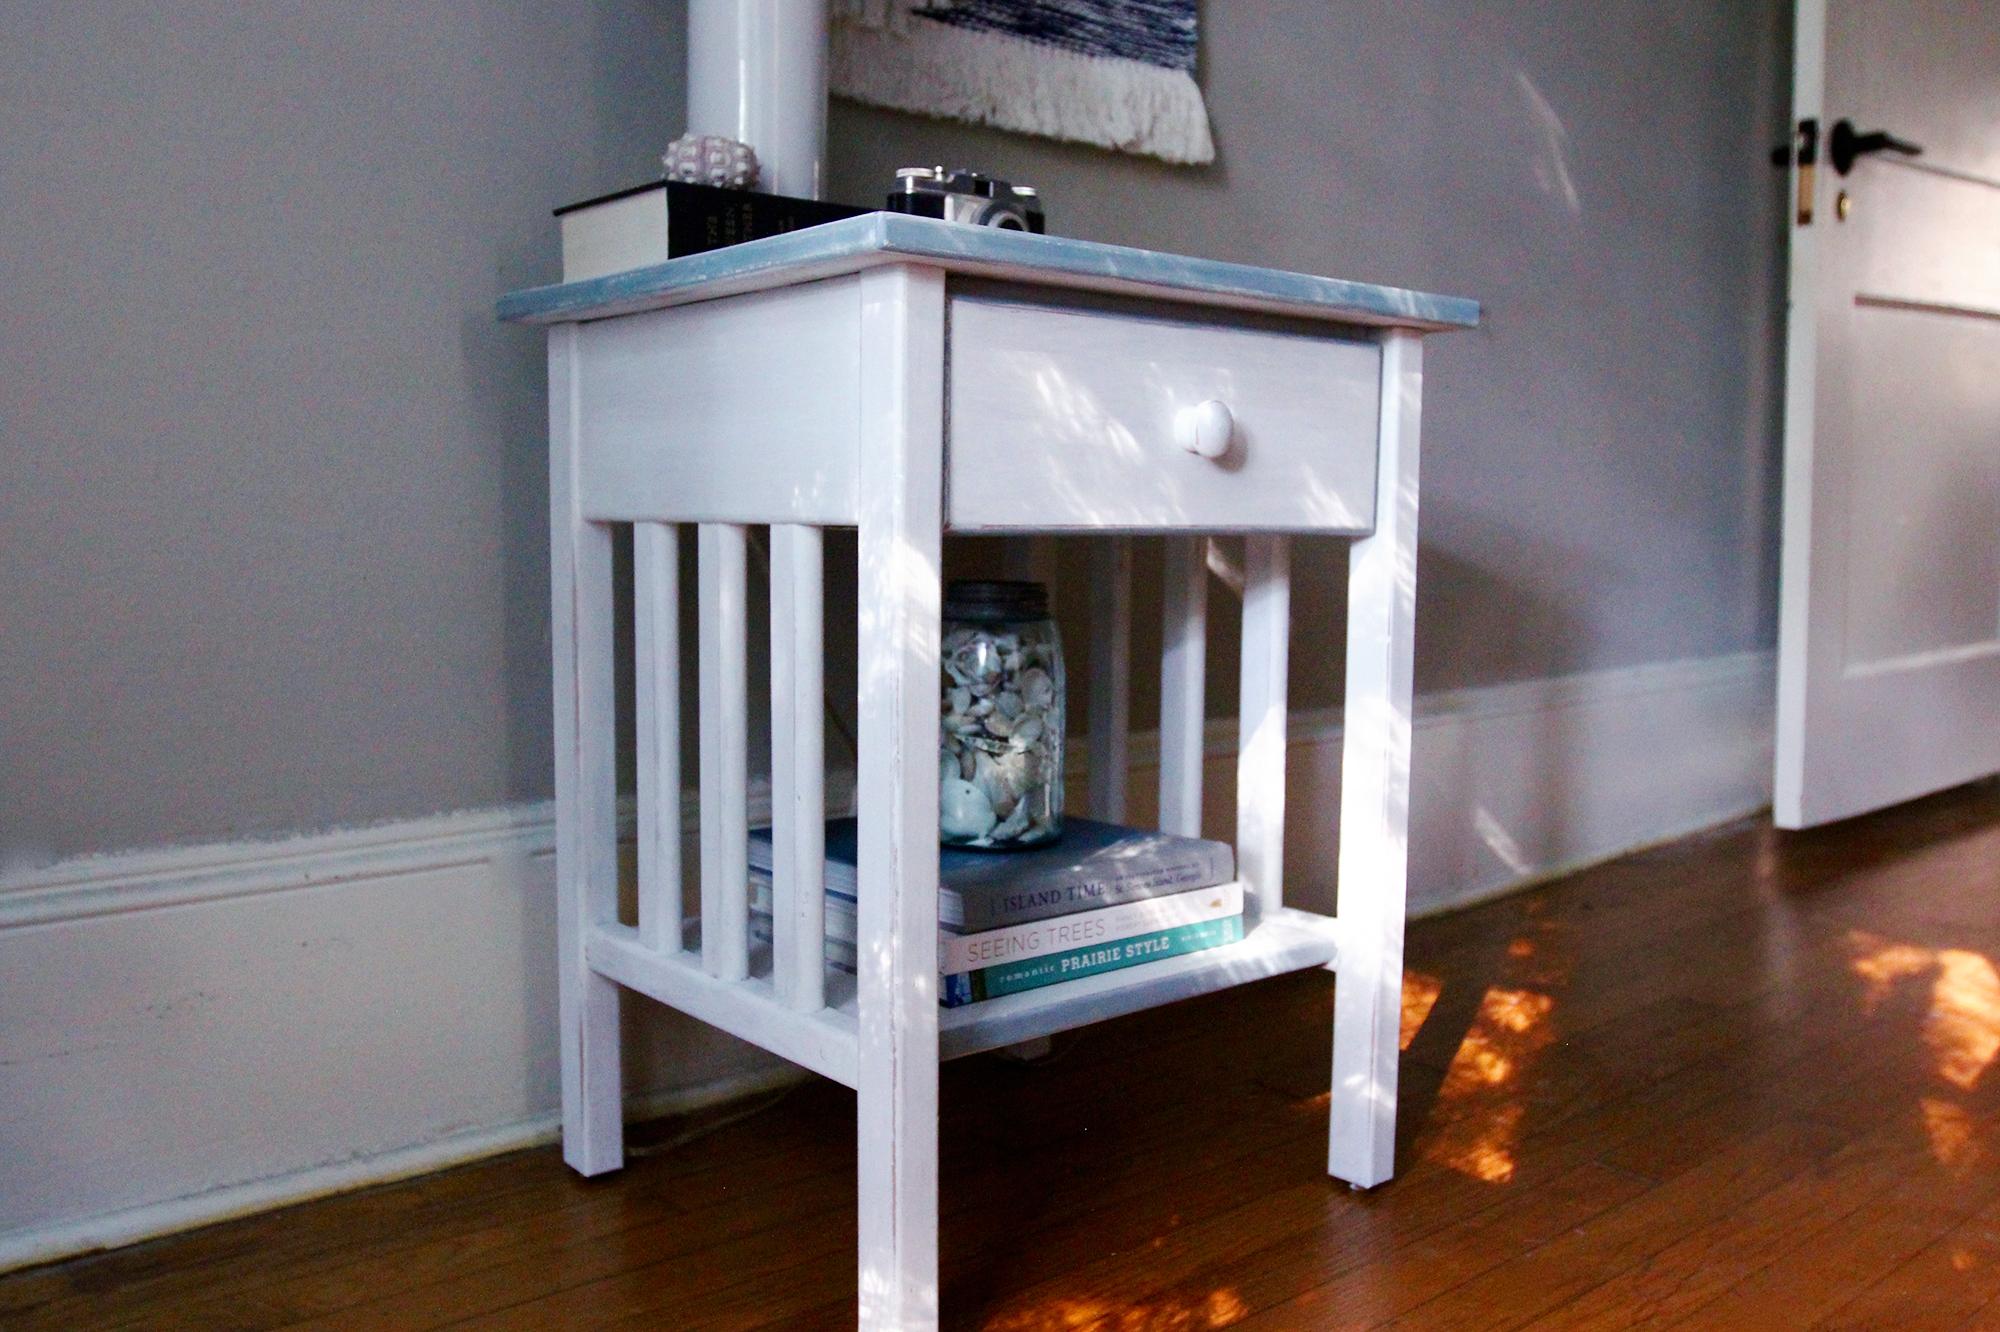 jo-torrijos-a-simpler-design-annie-sloan-pure-white-gray-trim-nightstand-atlanta-painted-furniture-3.jpg